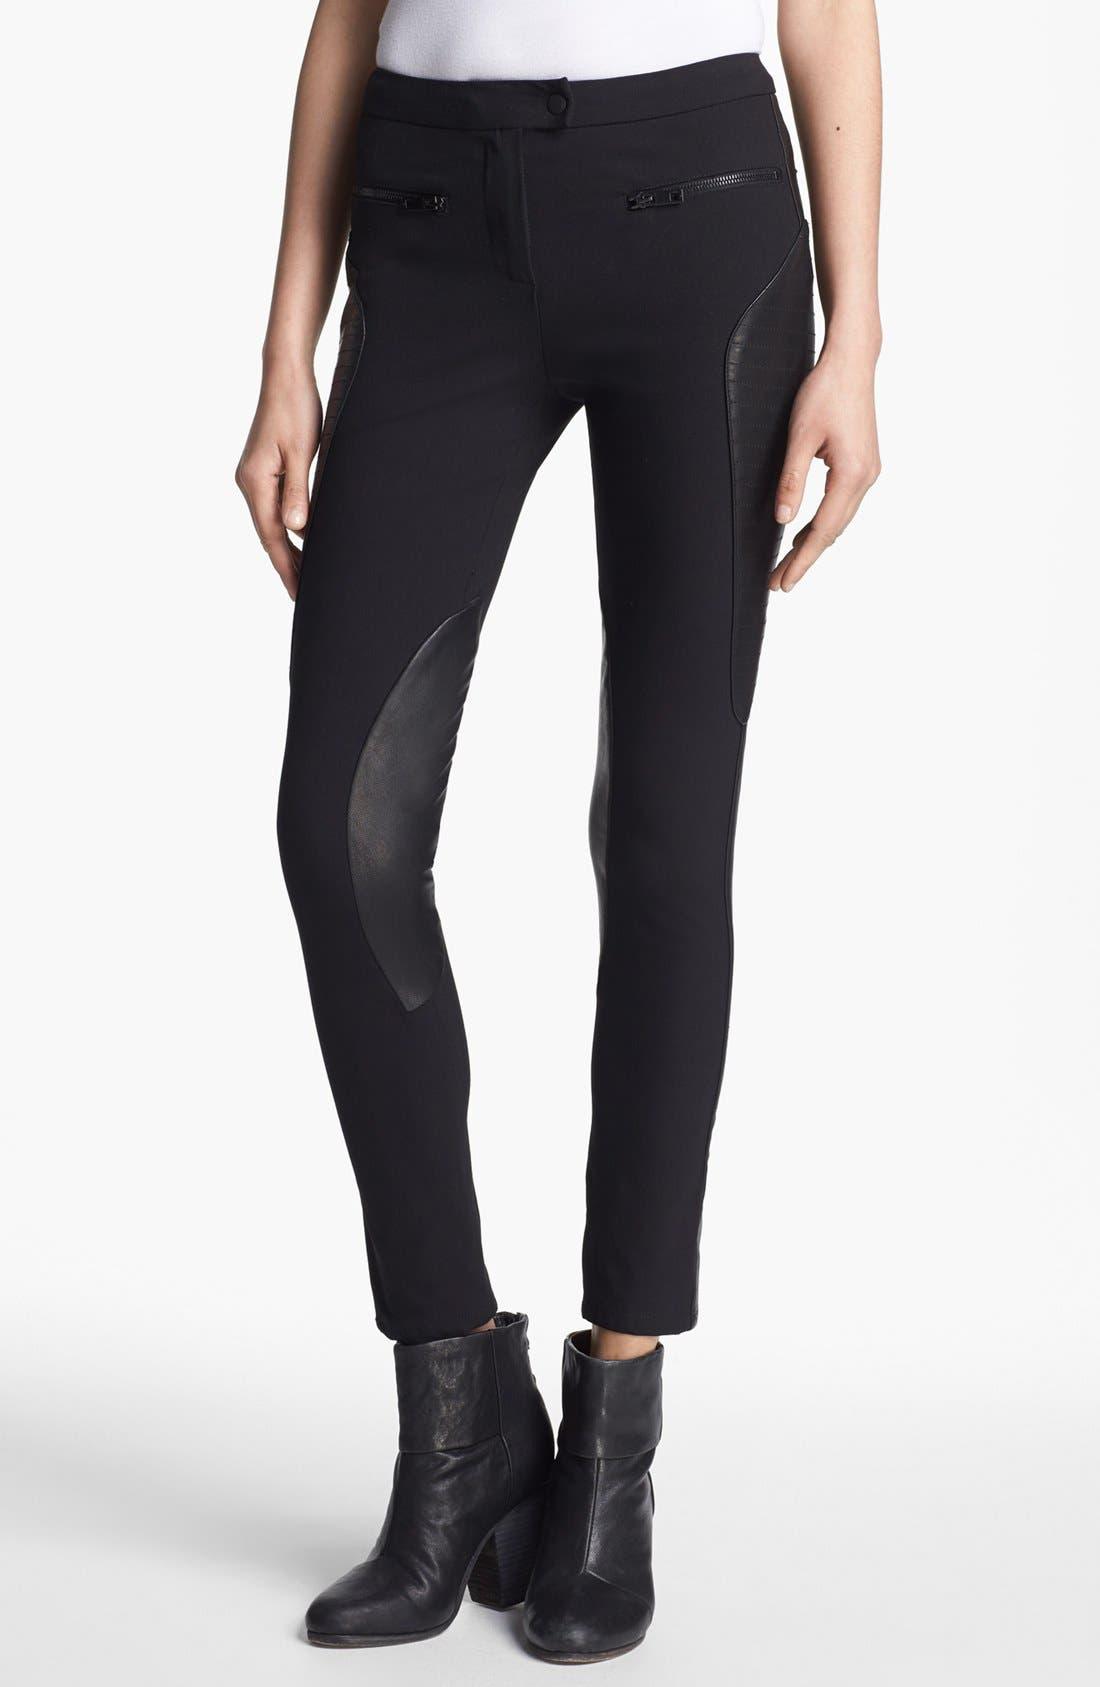 Alternate Image 1 Selected - rag & bone 'Ilford' Leather Panel Pants